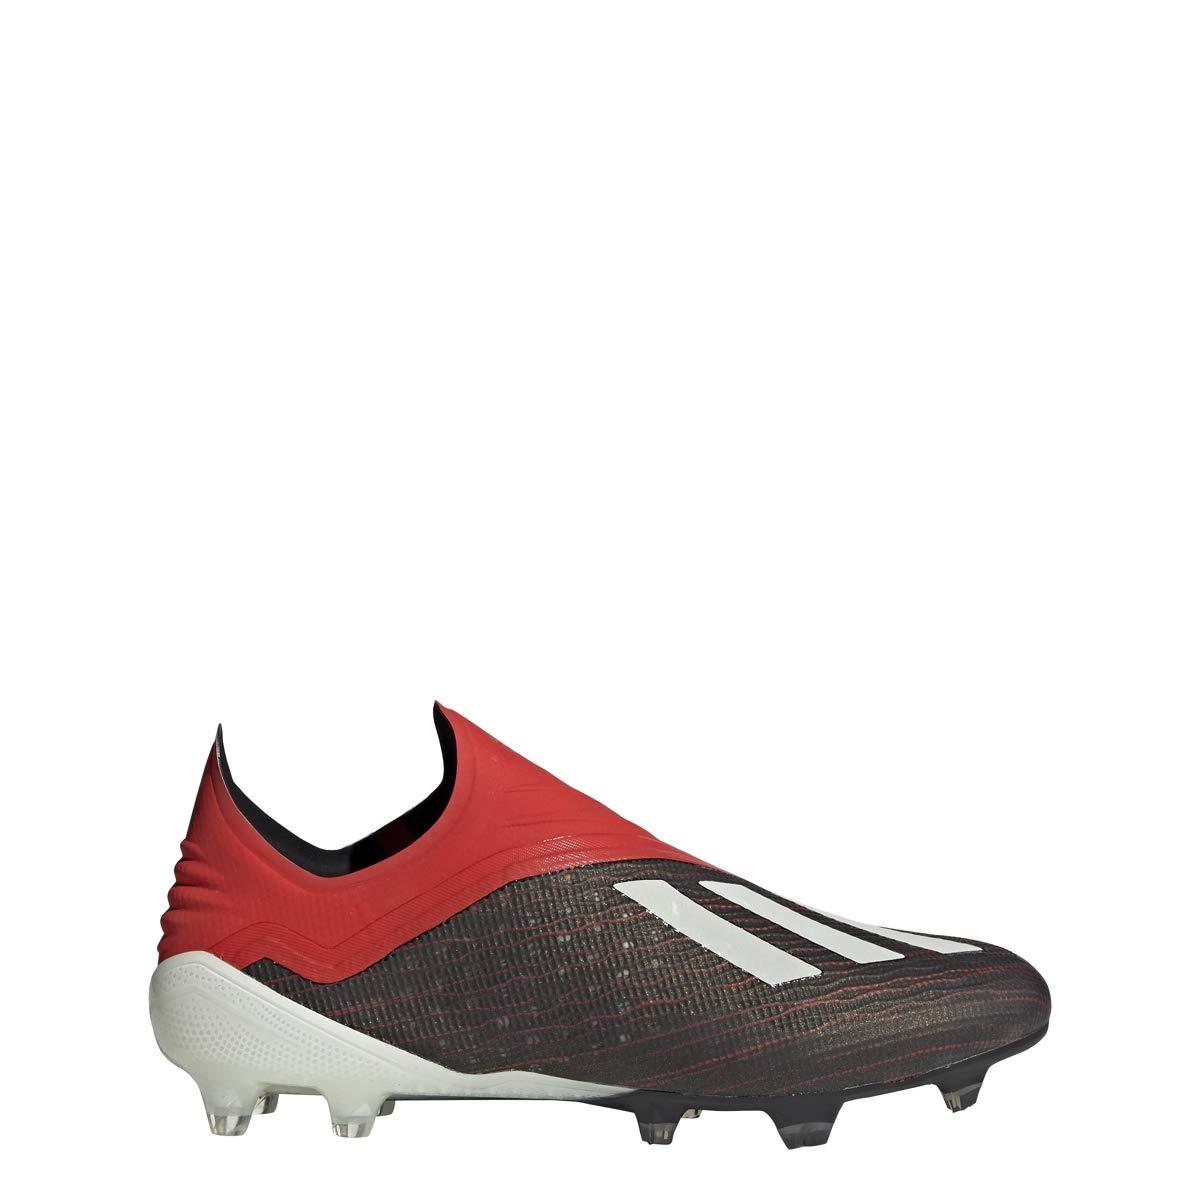 55b5757772a5b adidas Men's X 18+ FG Soccer Cleat